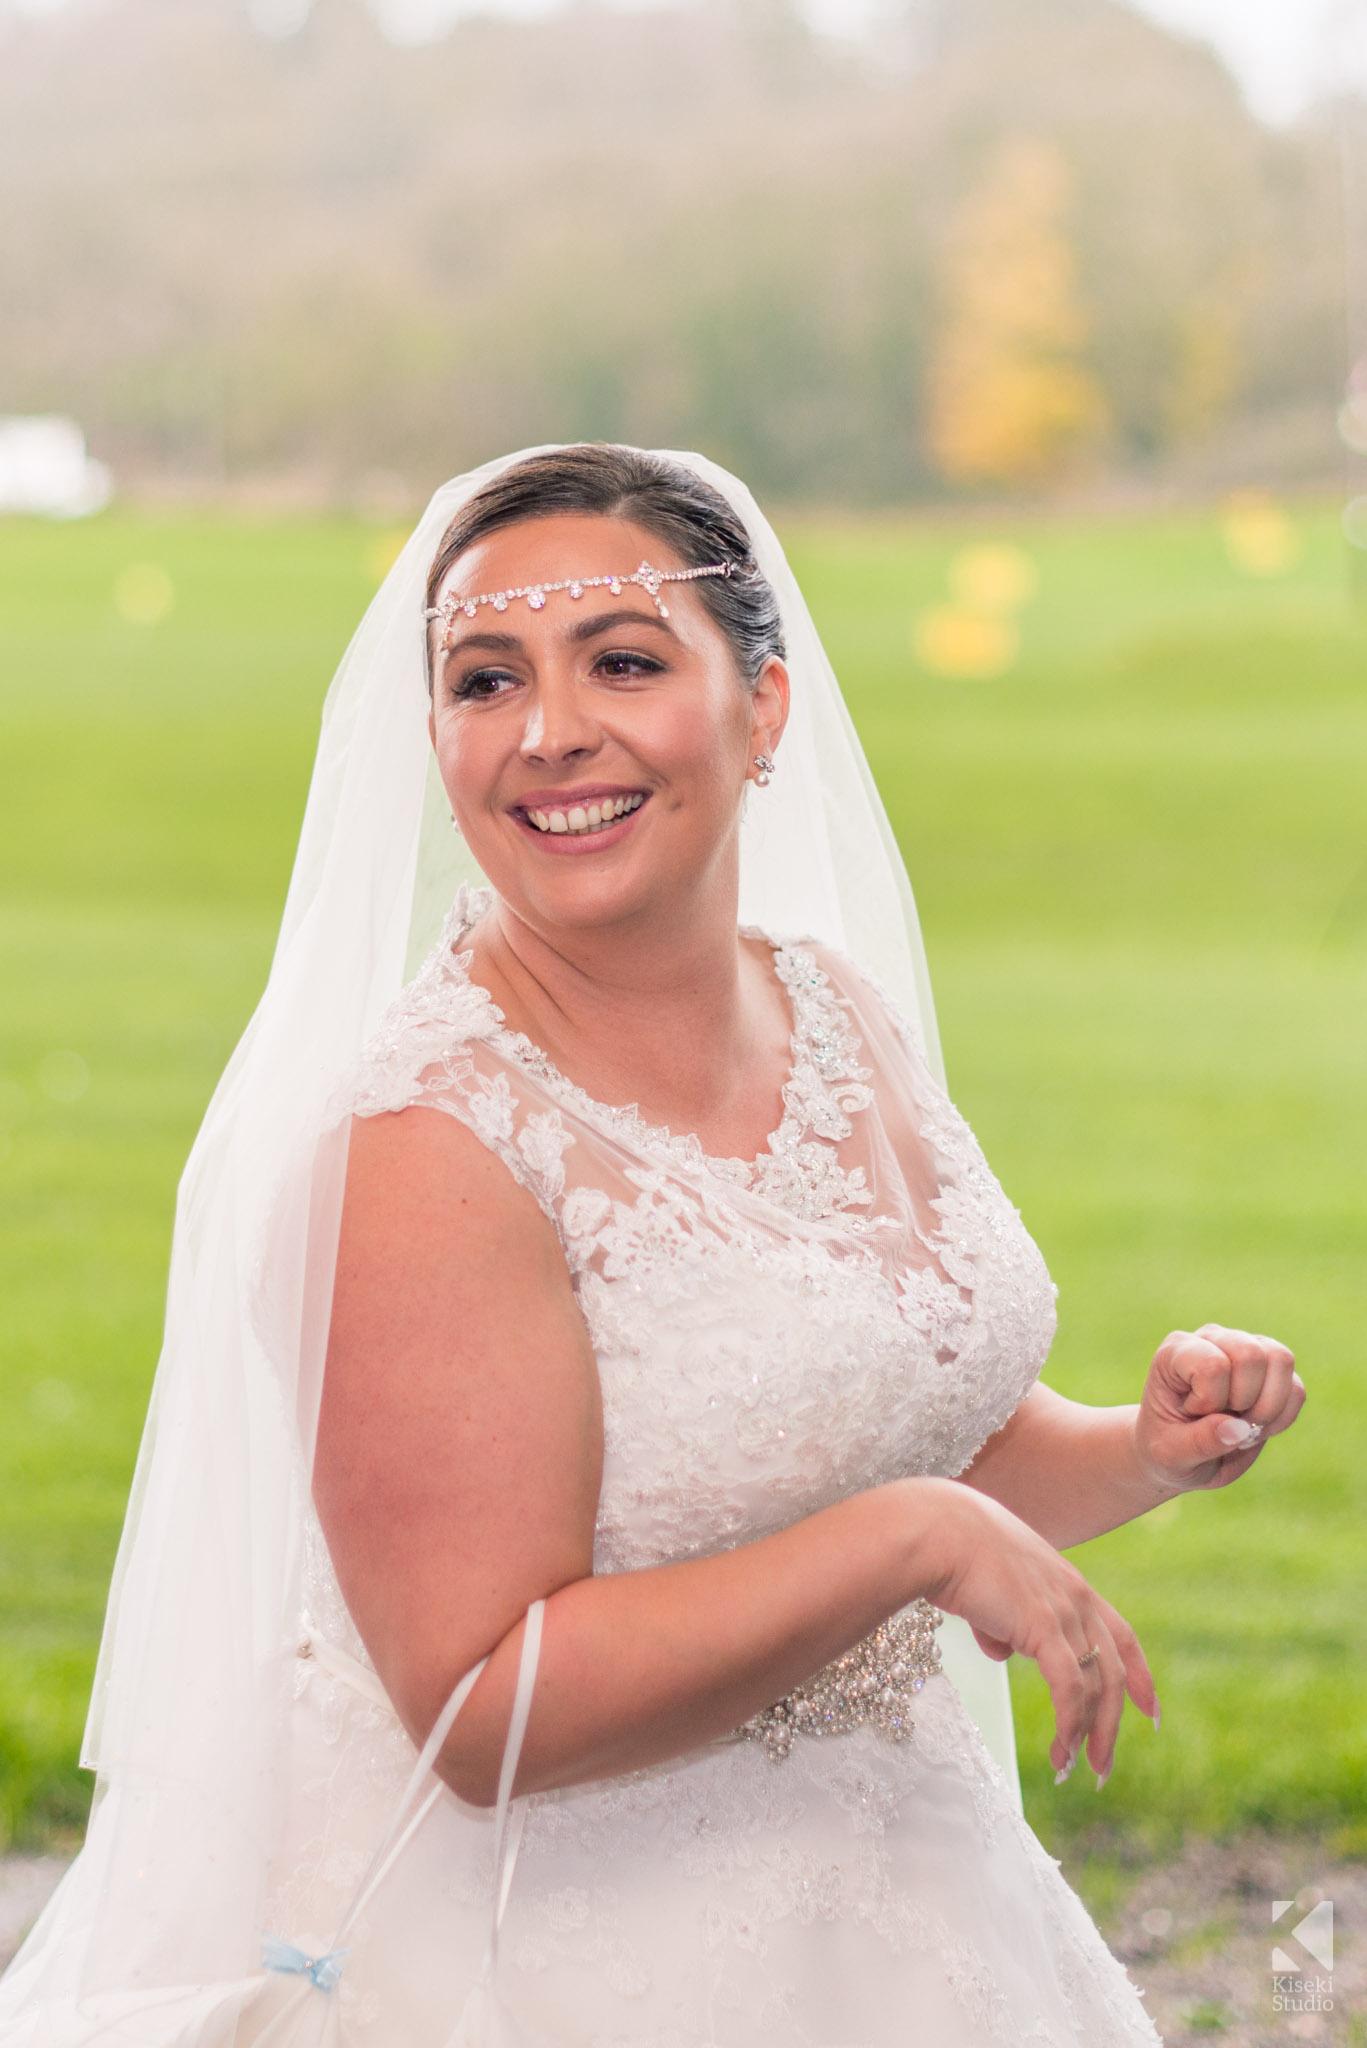 Bride posing a the golf driving range